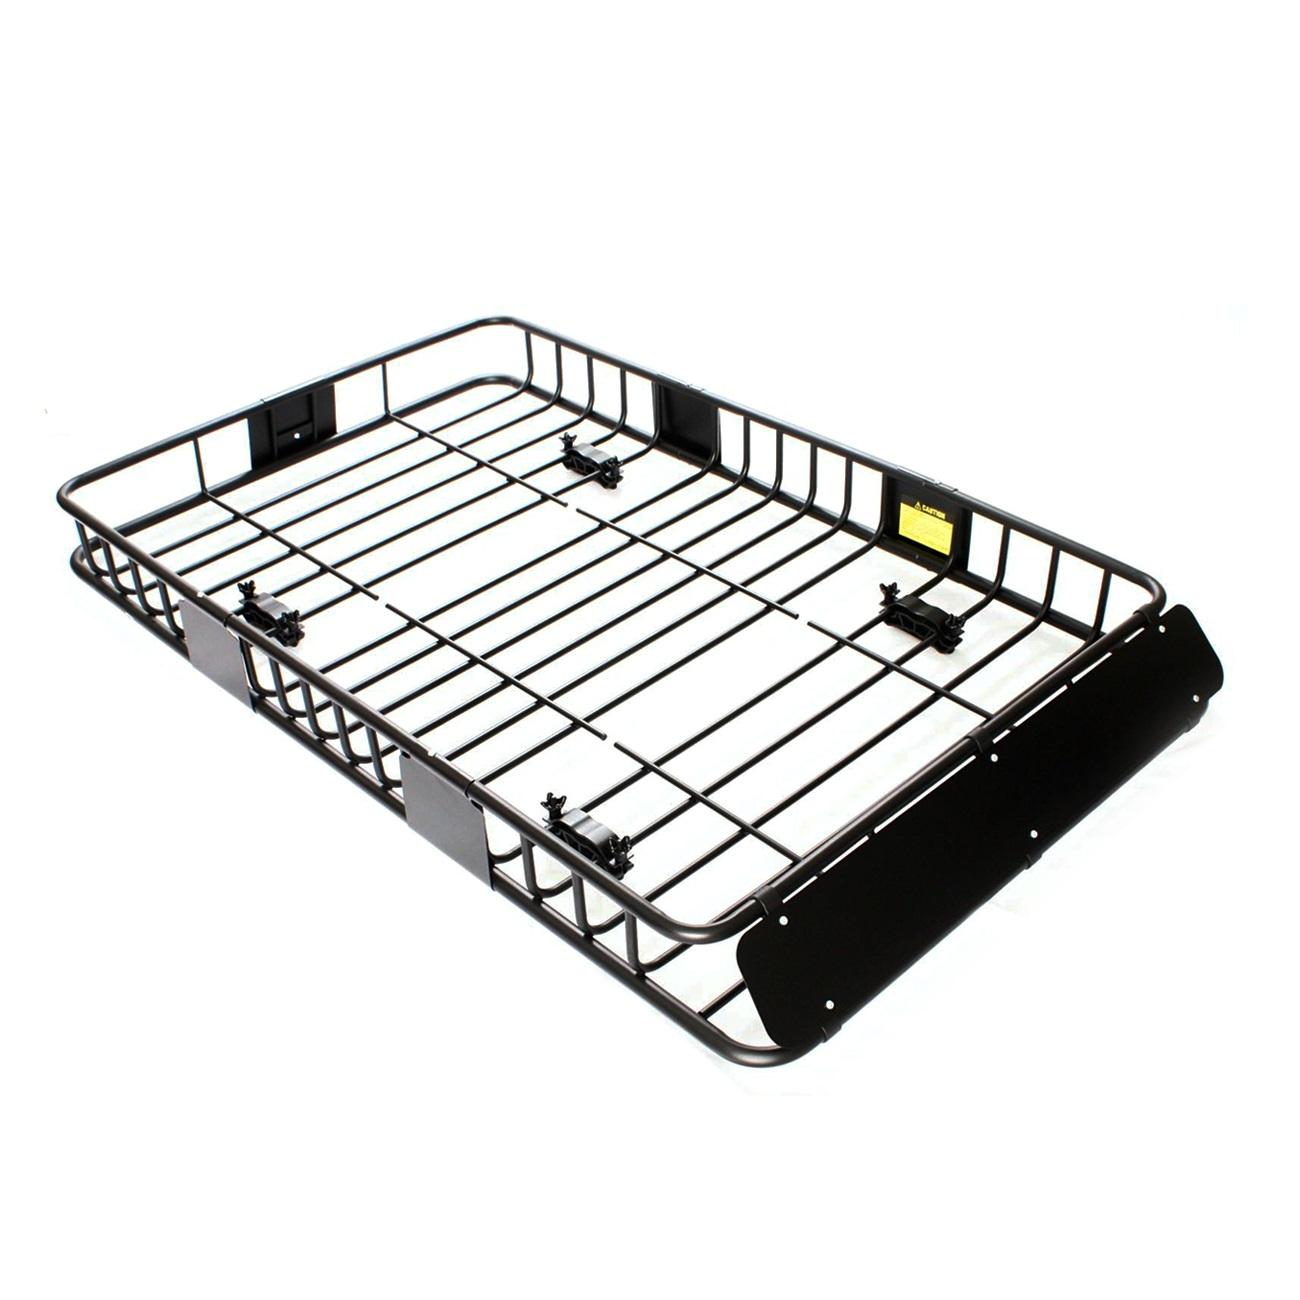 64 Black Universal Roof Rack W Extension Cargo Top